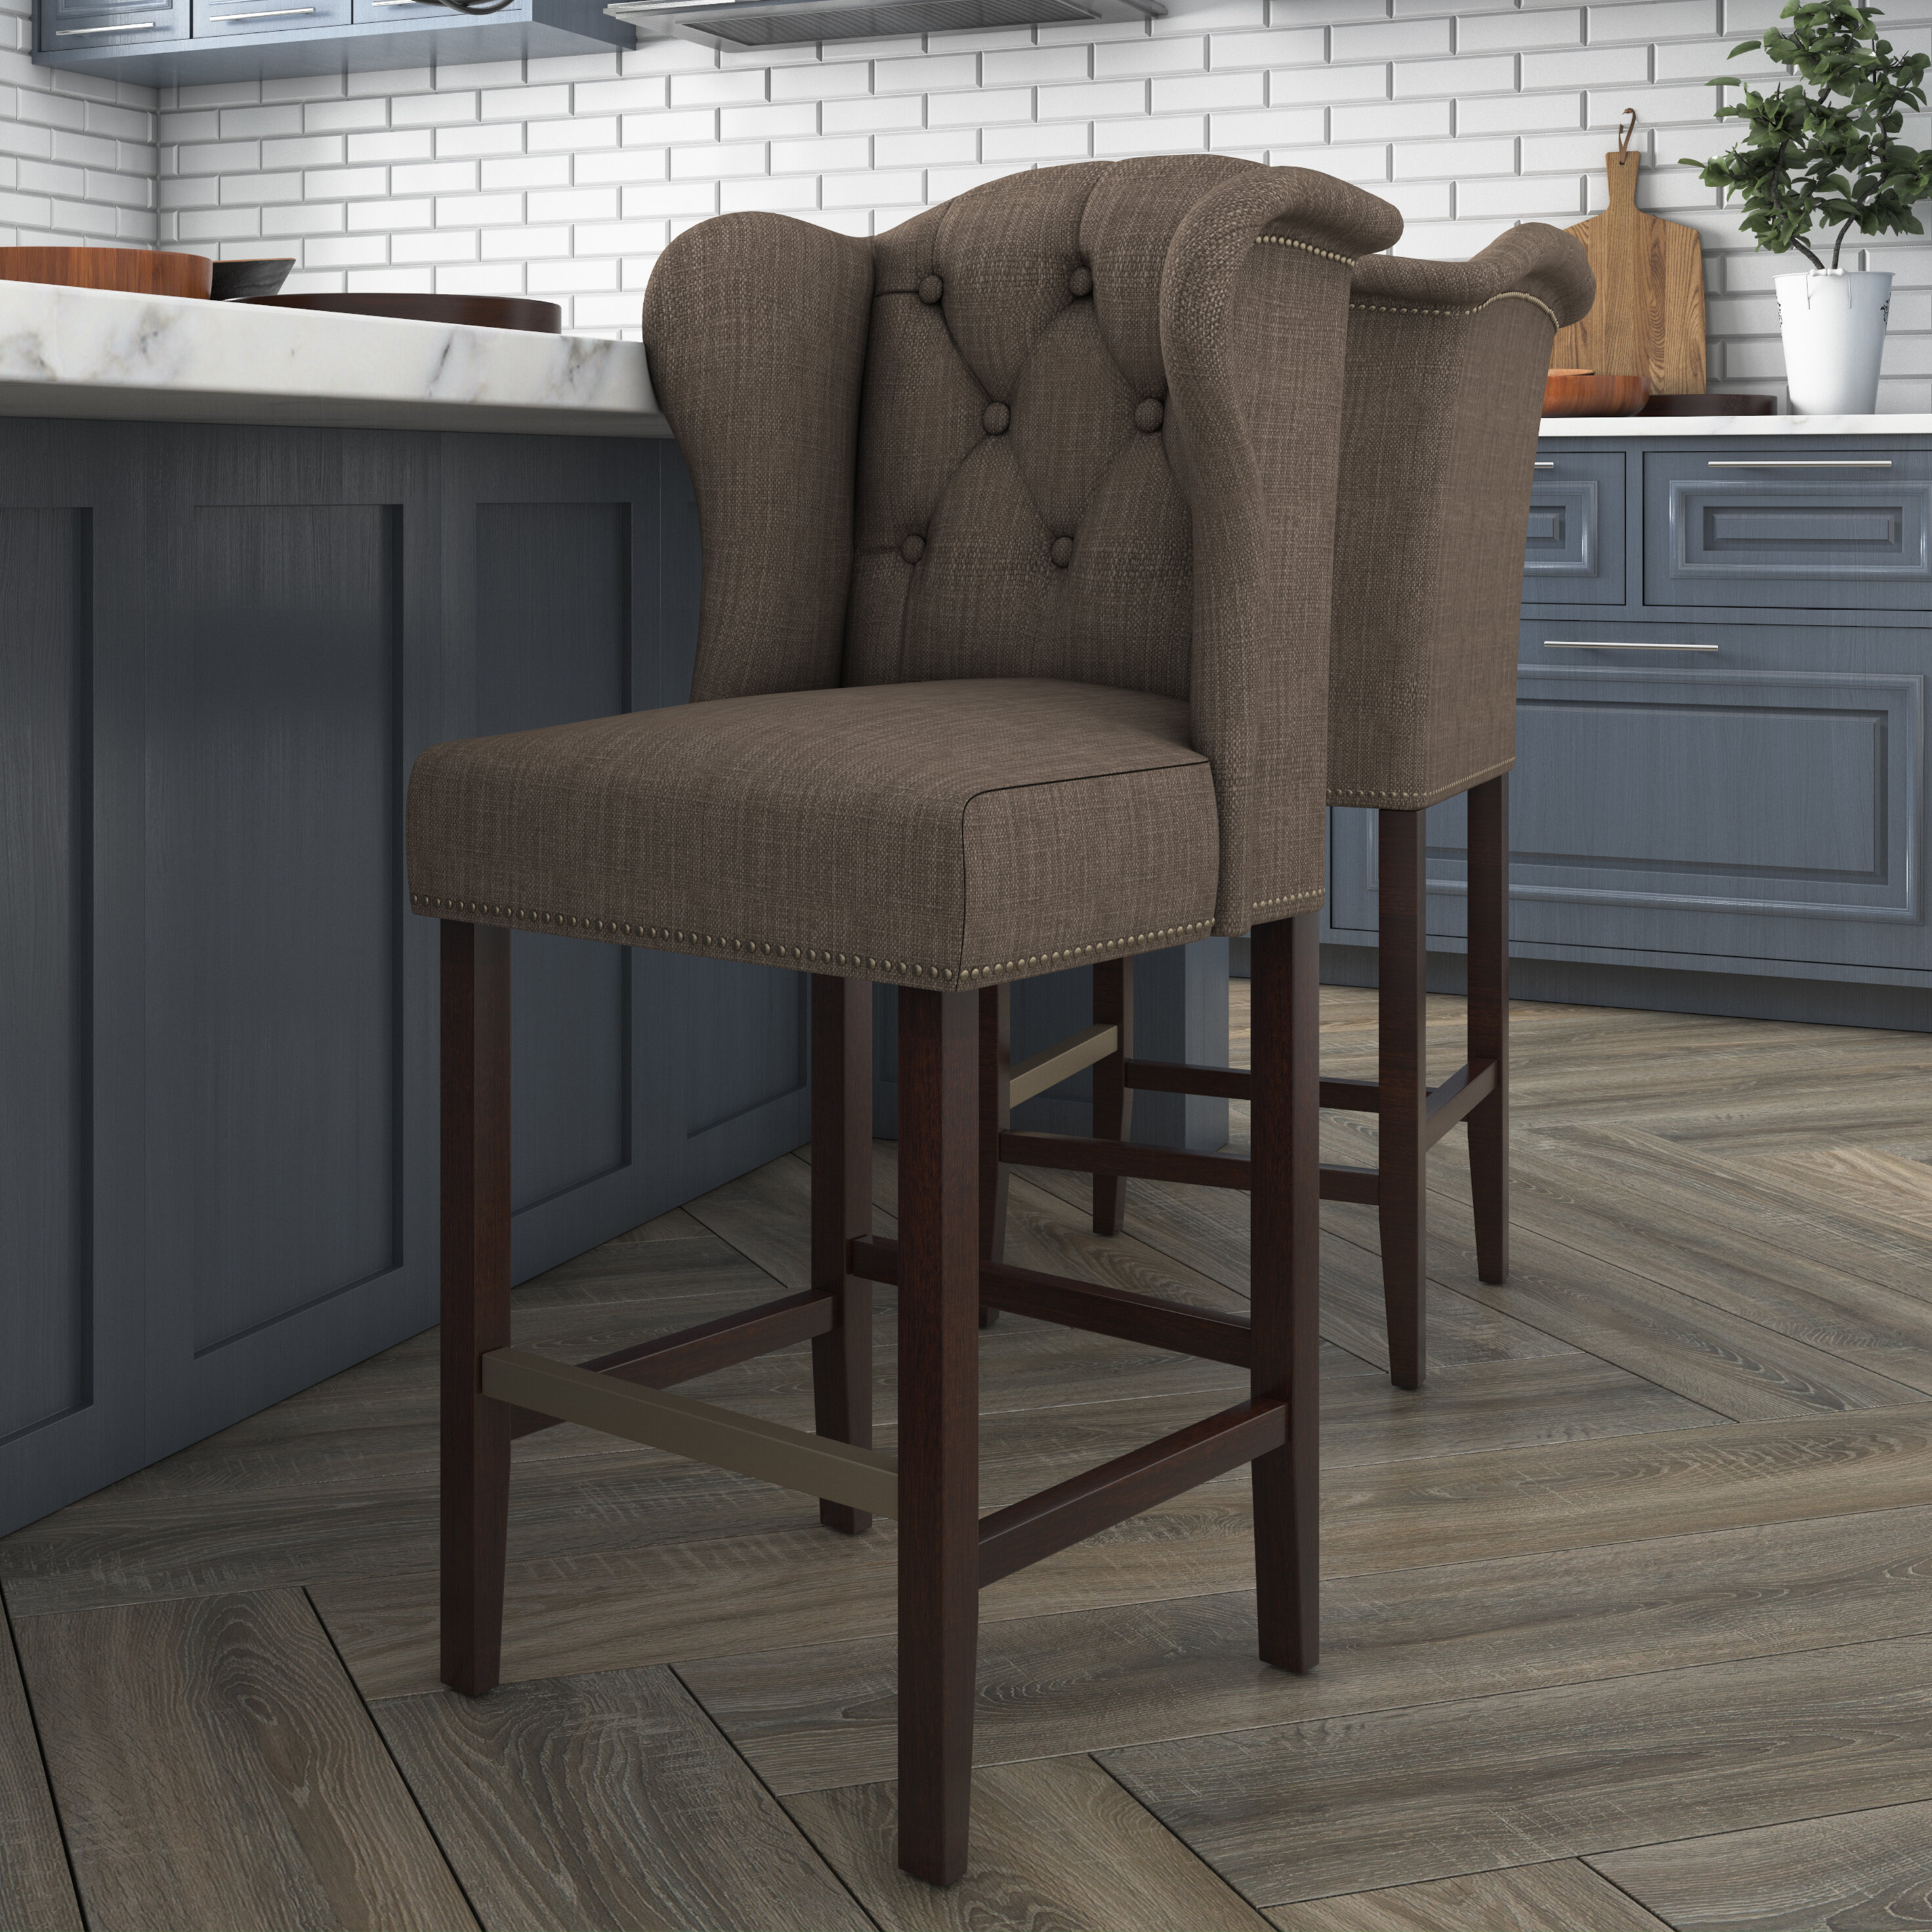 Tremendous Veatch Bar Counter Stool Uwap Interior Chair Design Uwaporg